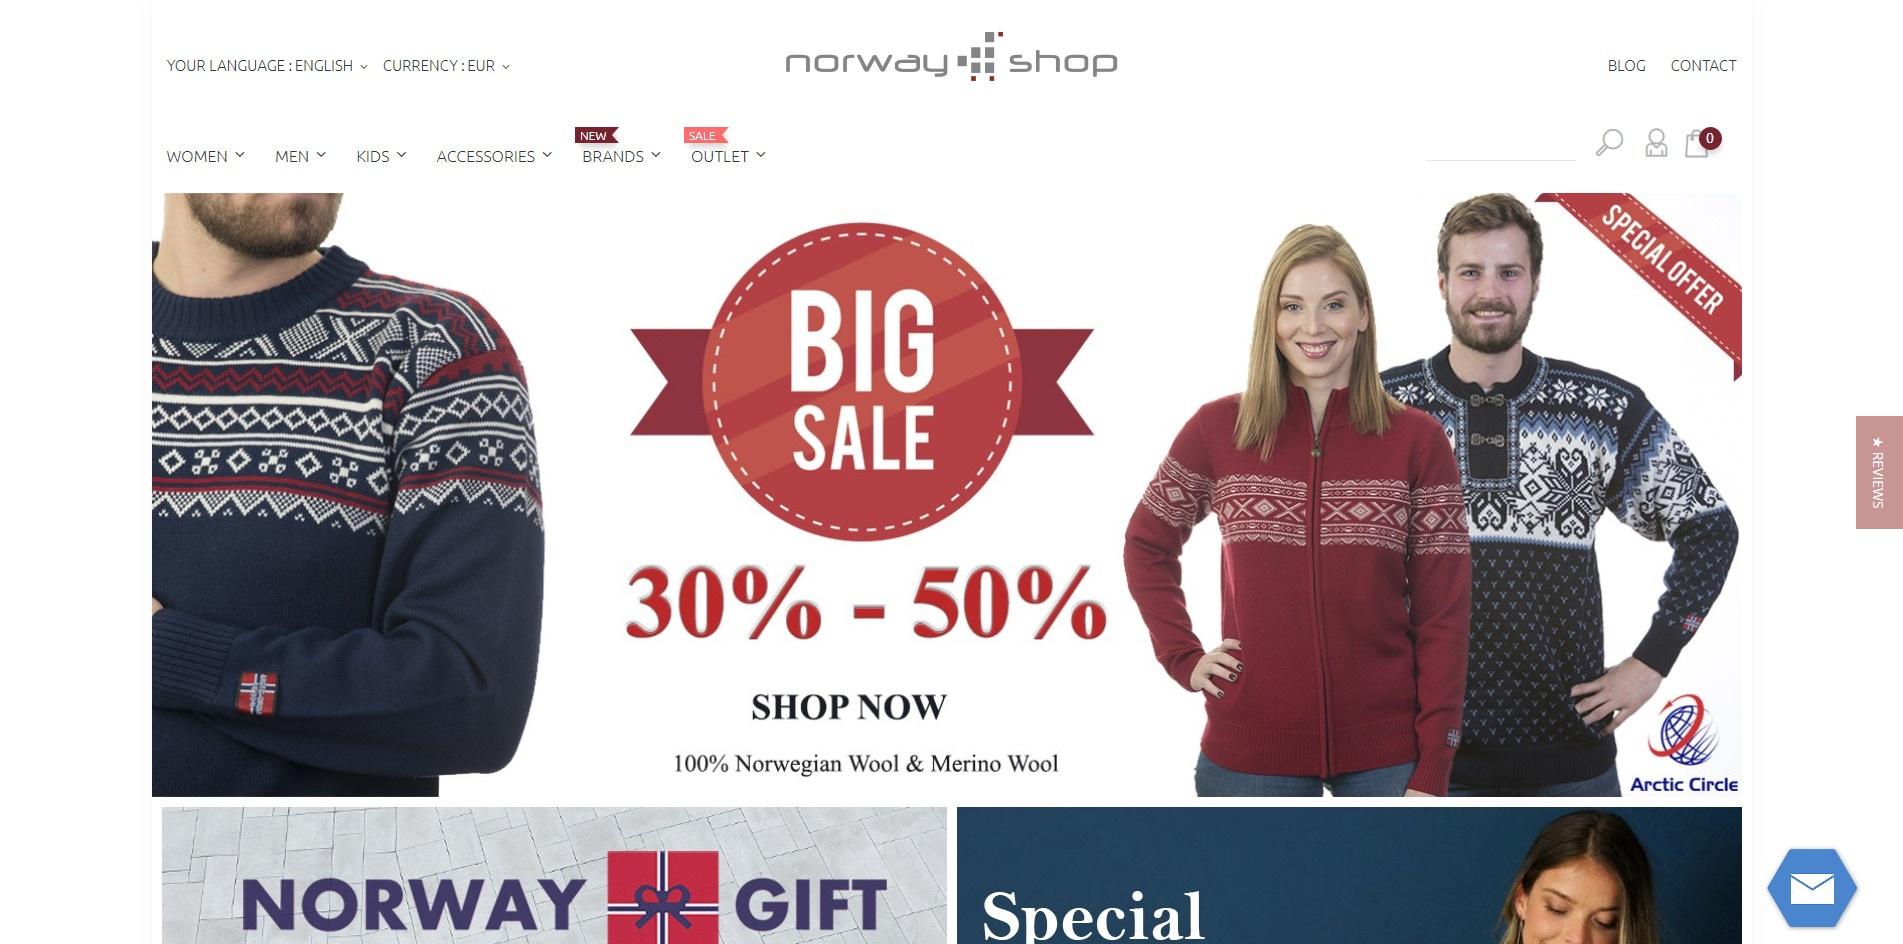 Sklep internetowy NorwayShop